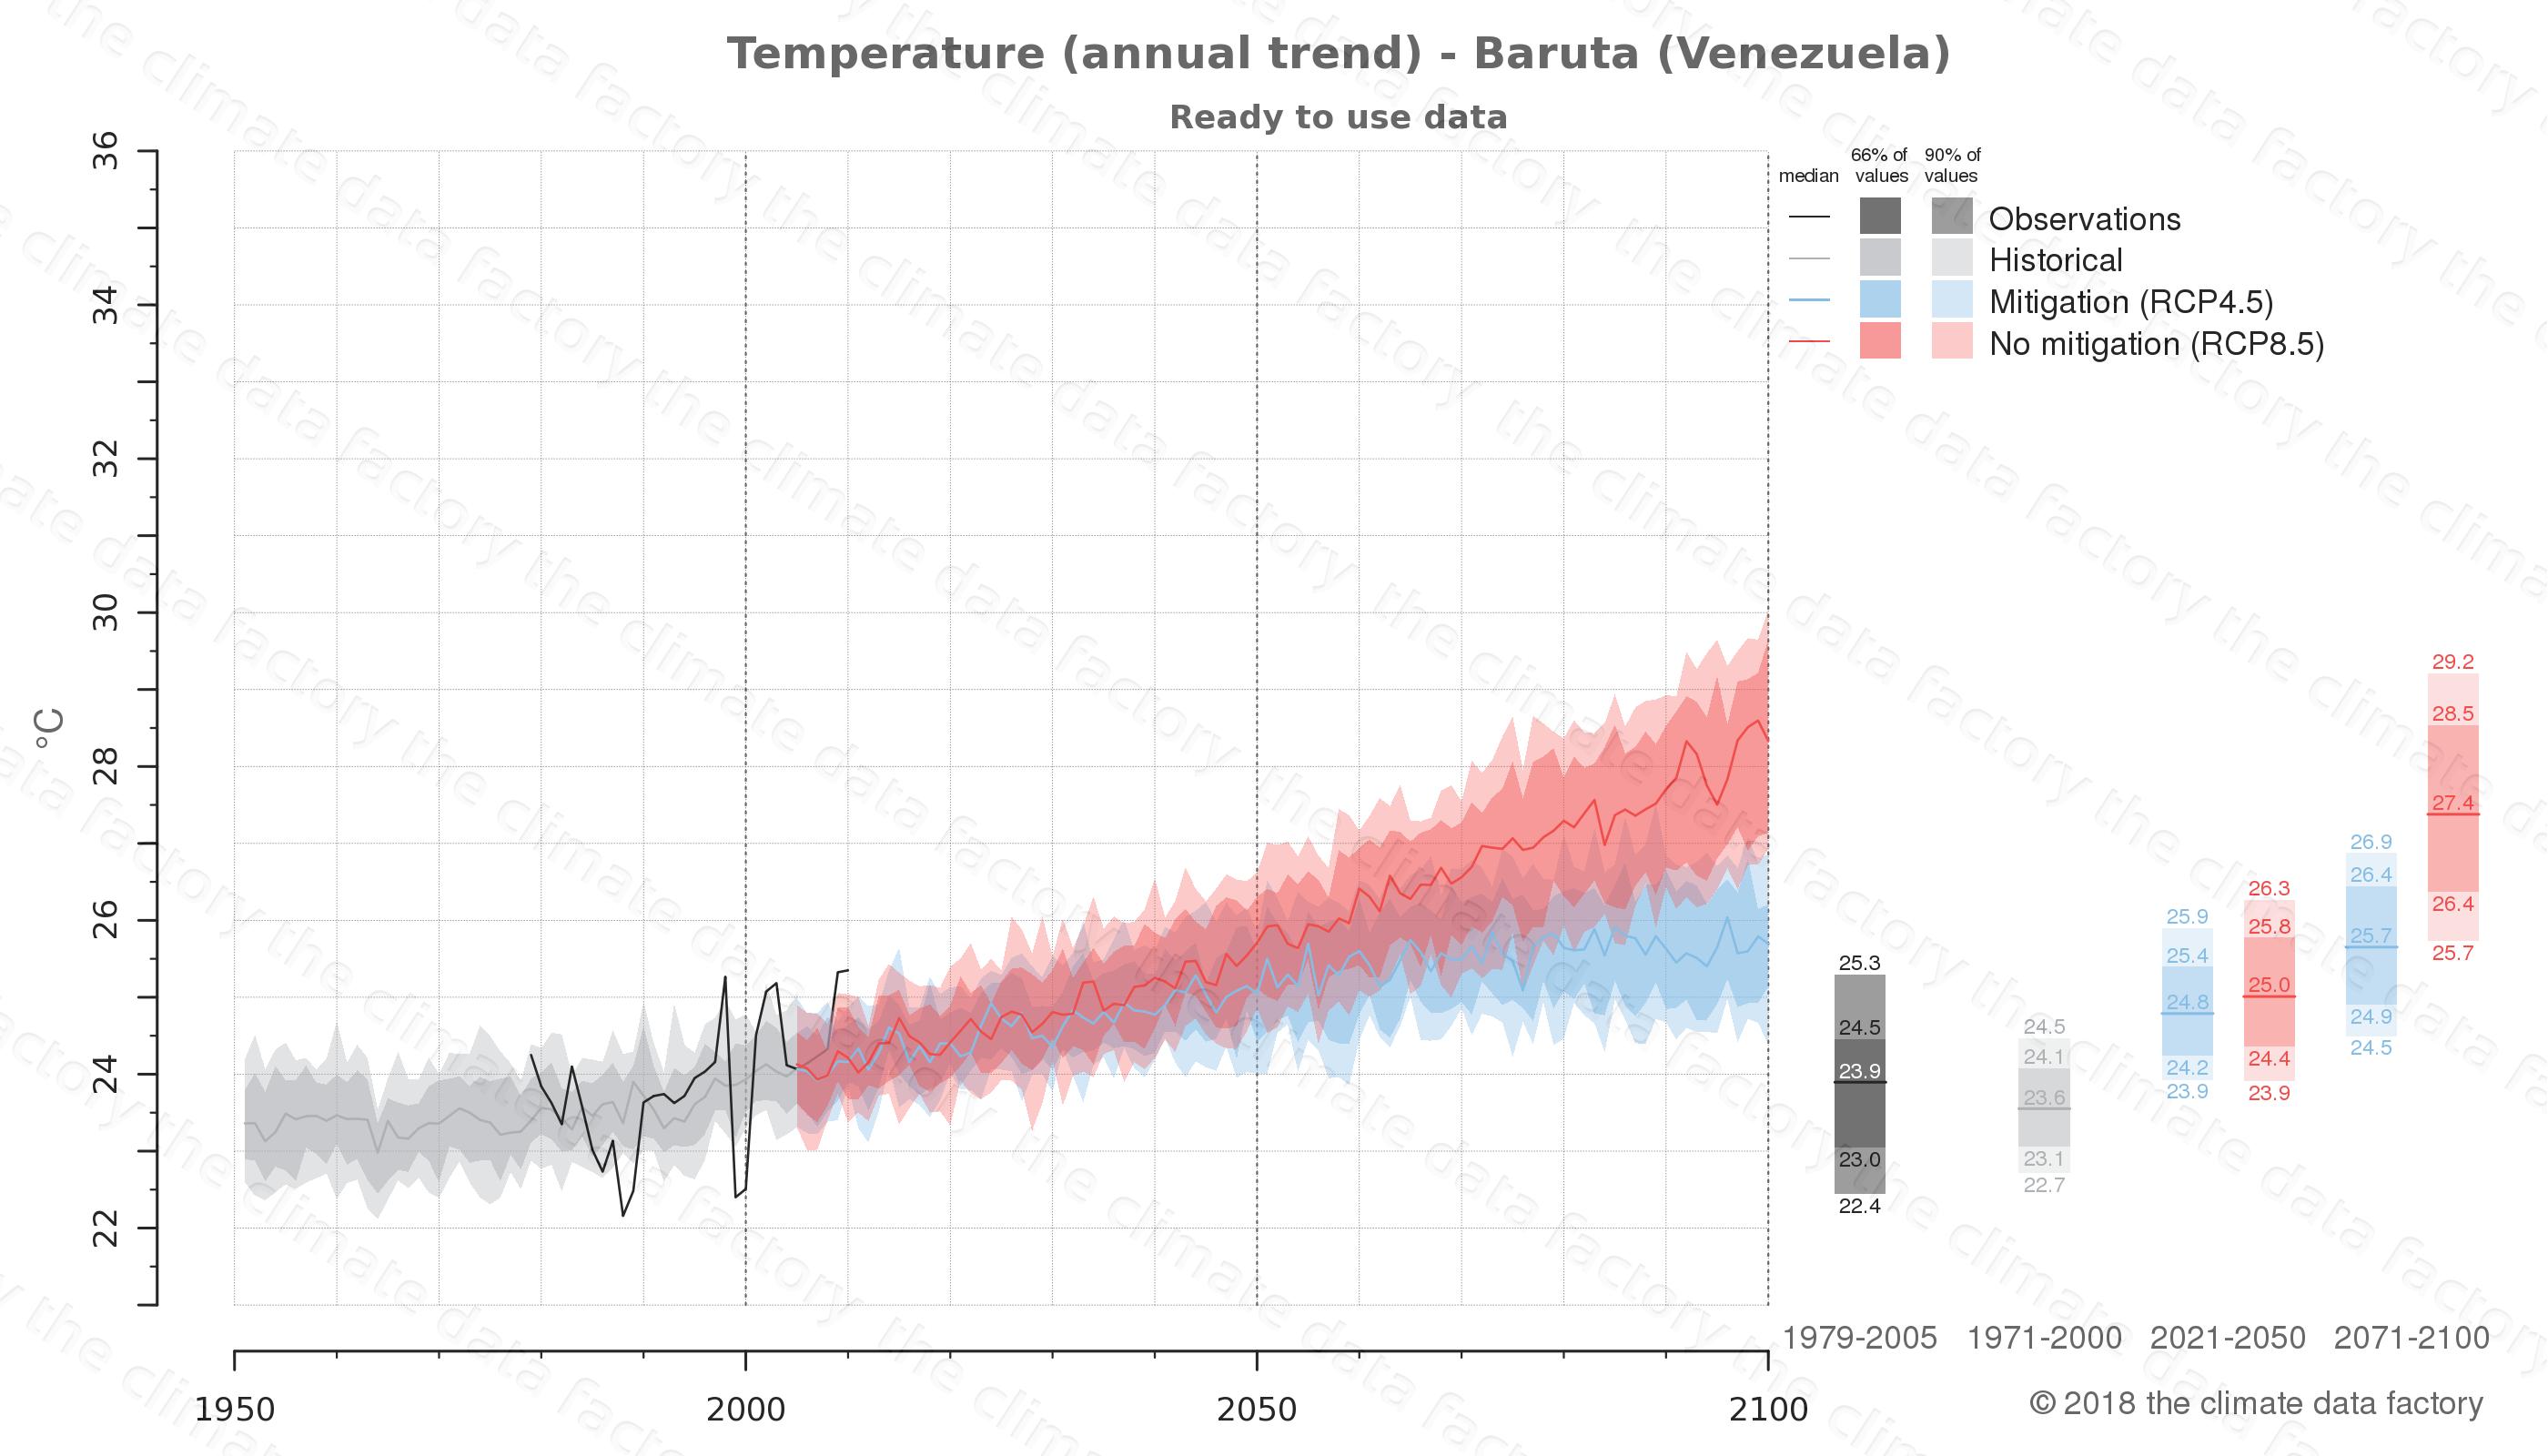 climate change data policy adaptation climate graph city data temperature baruta venezuela